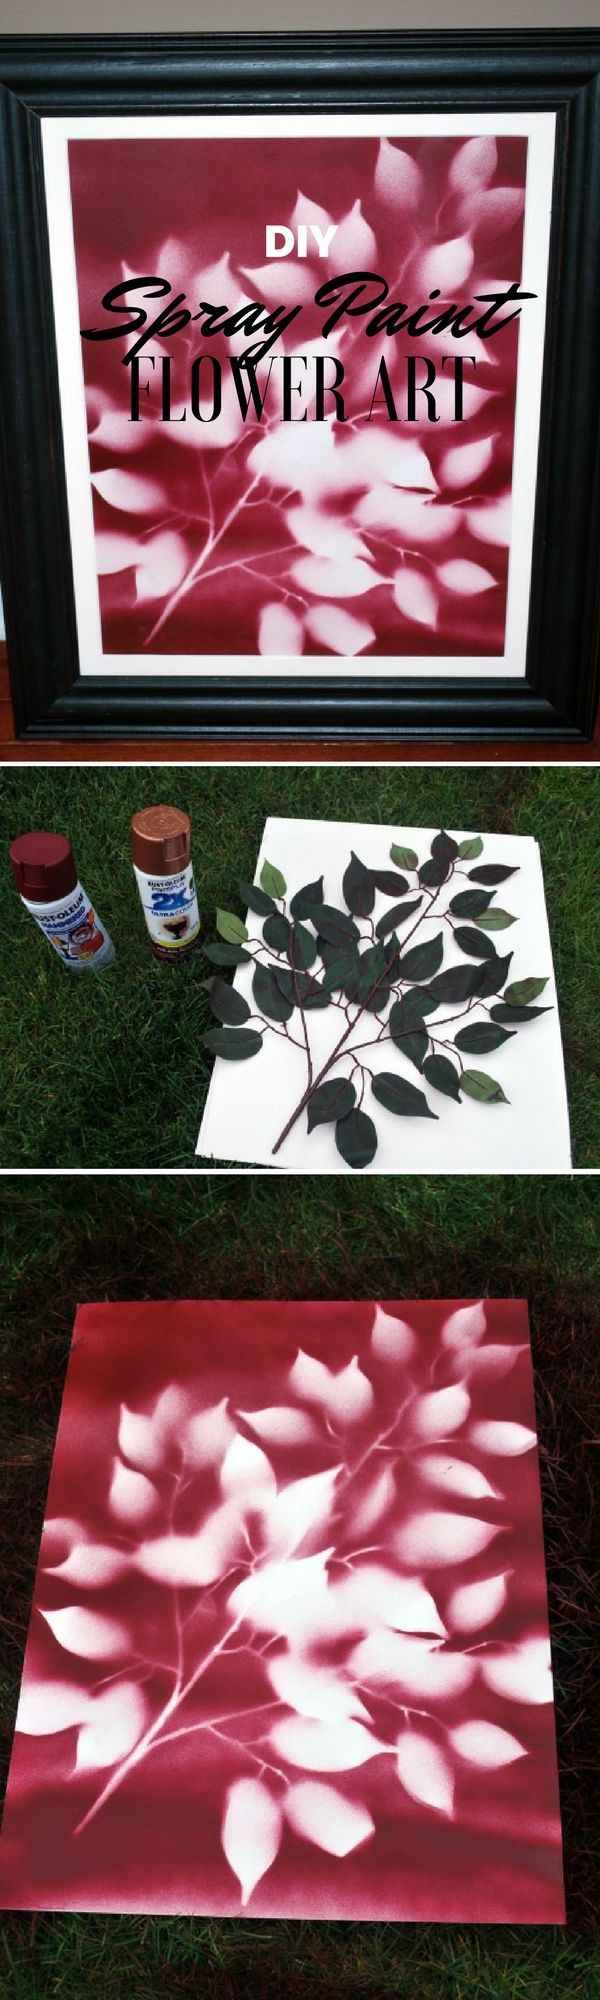 Check out the tutorial: #DIY Spray Paint Flower Art @istandarddesign